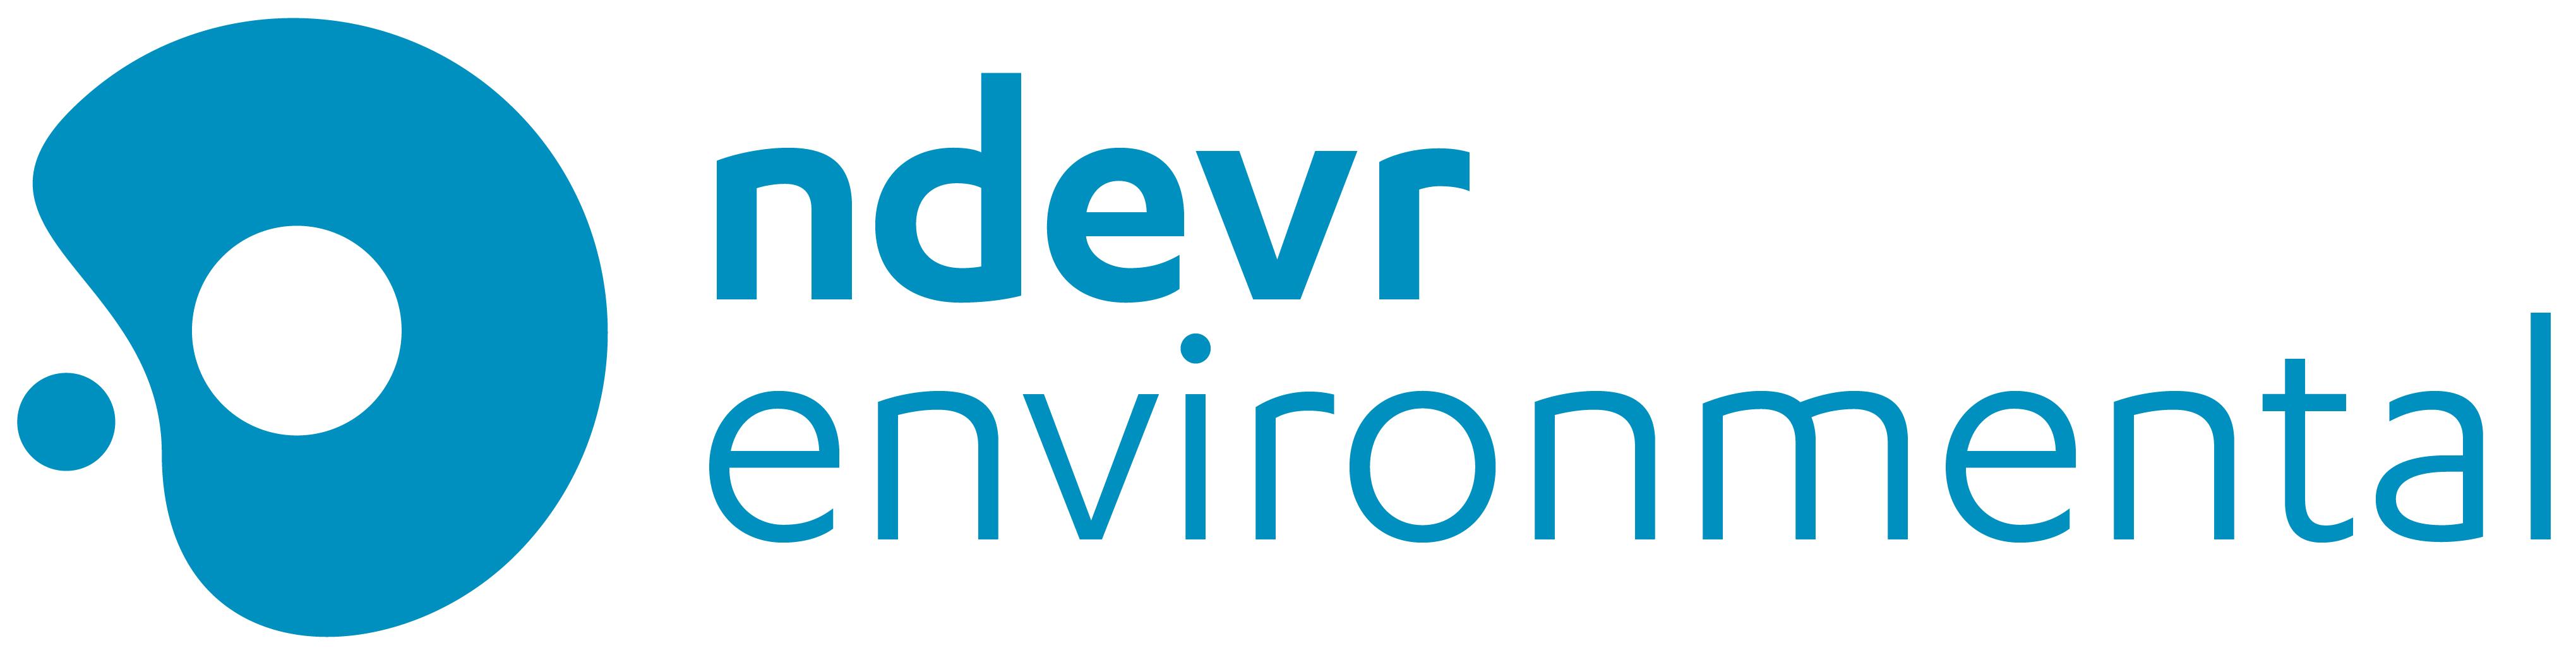 Logo for Ndevr Environmental